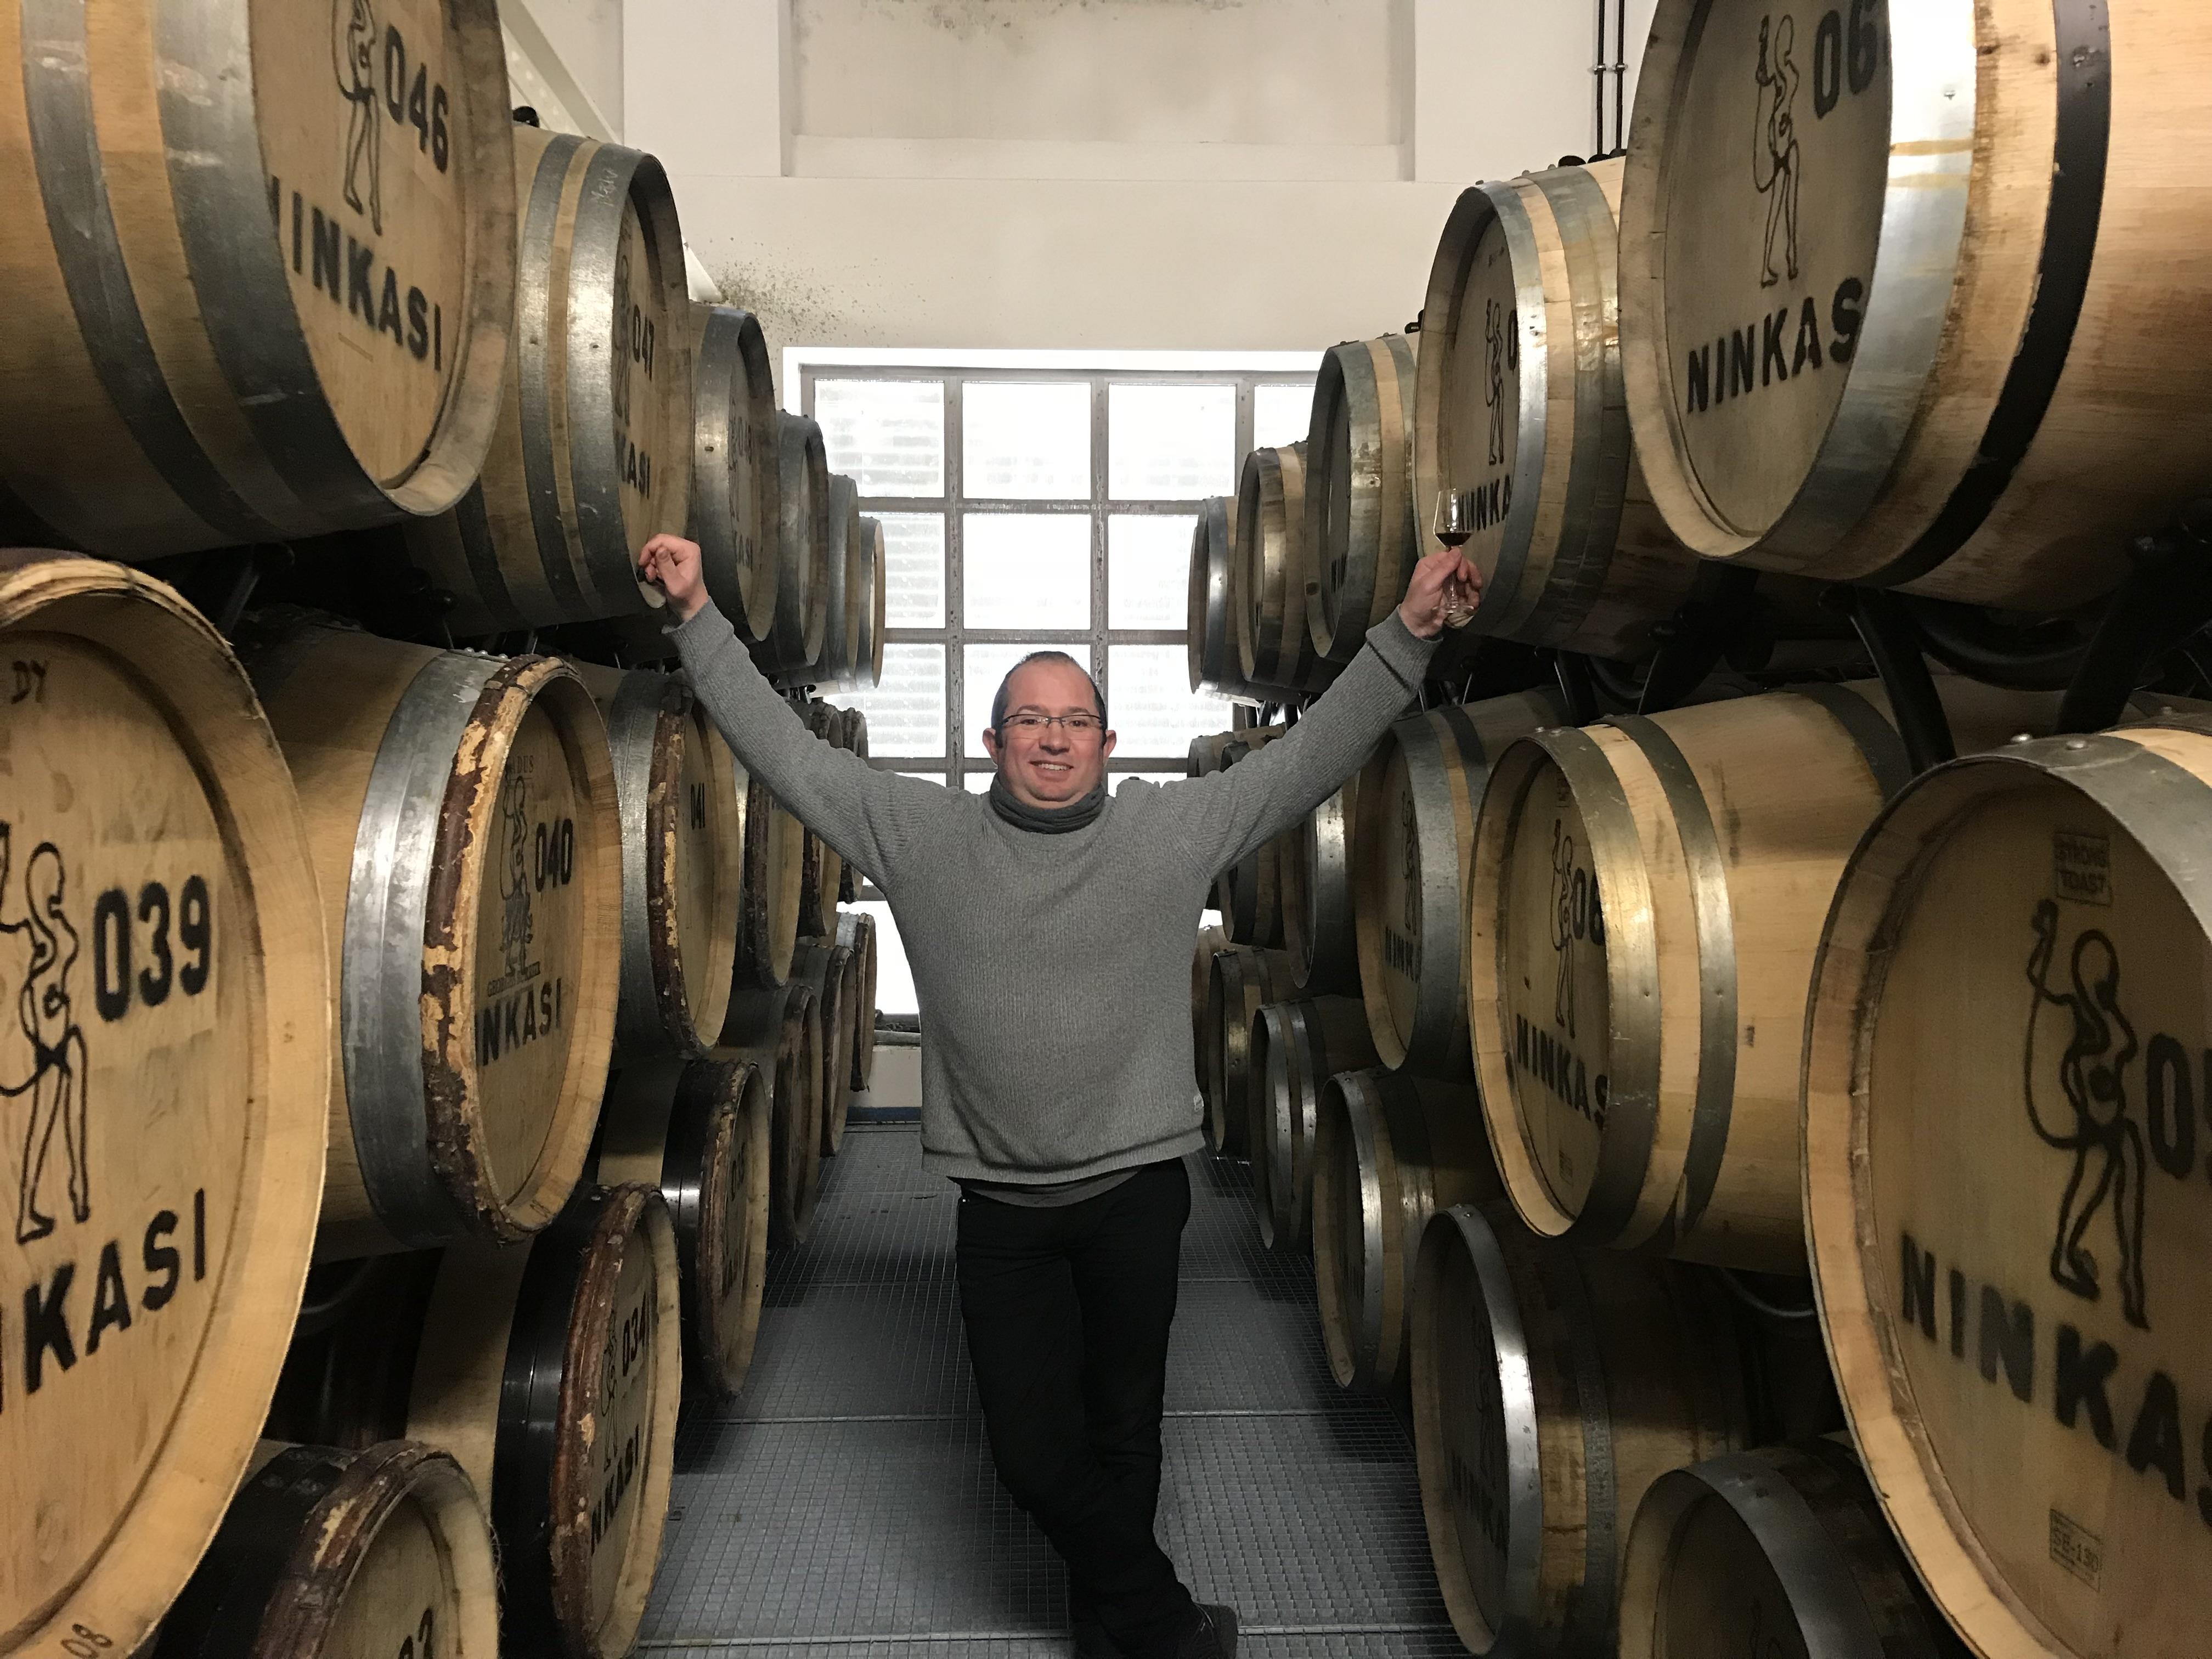 Alban maître distillateur